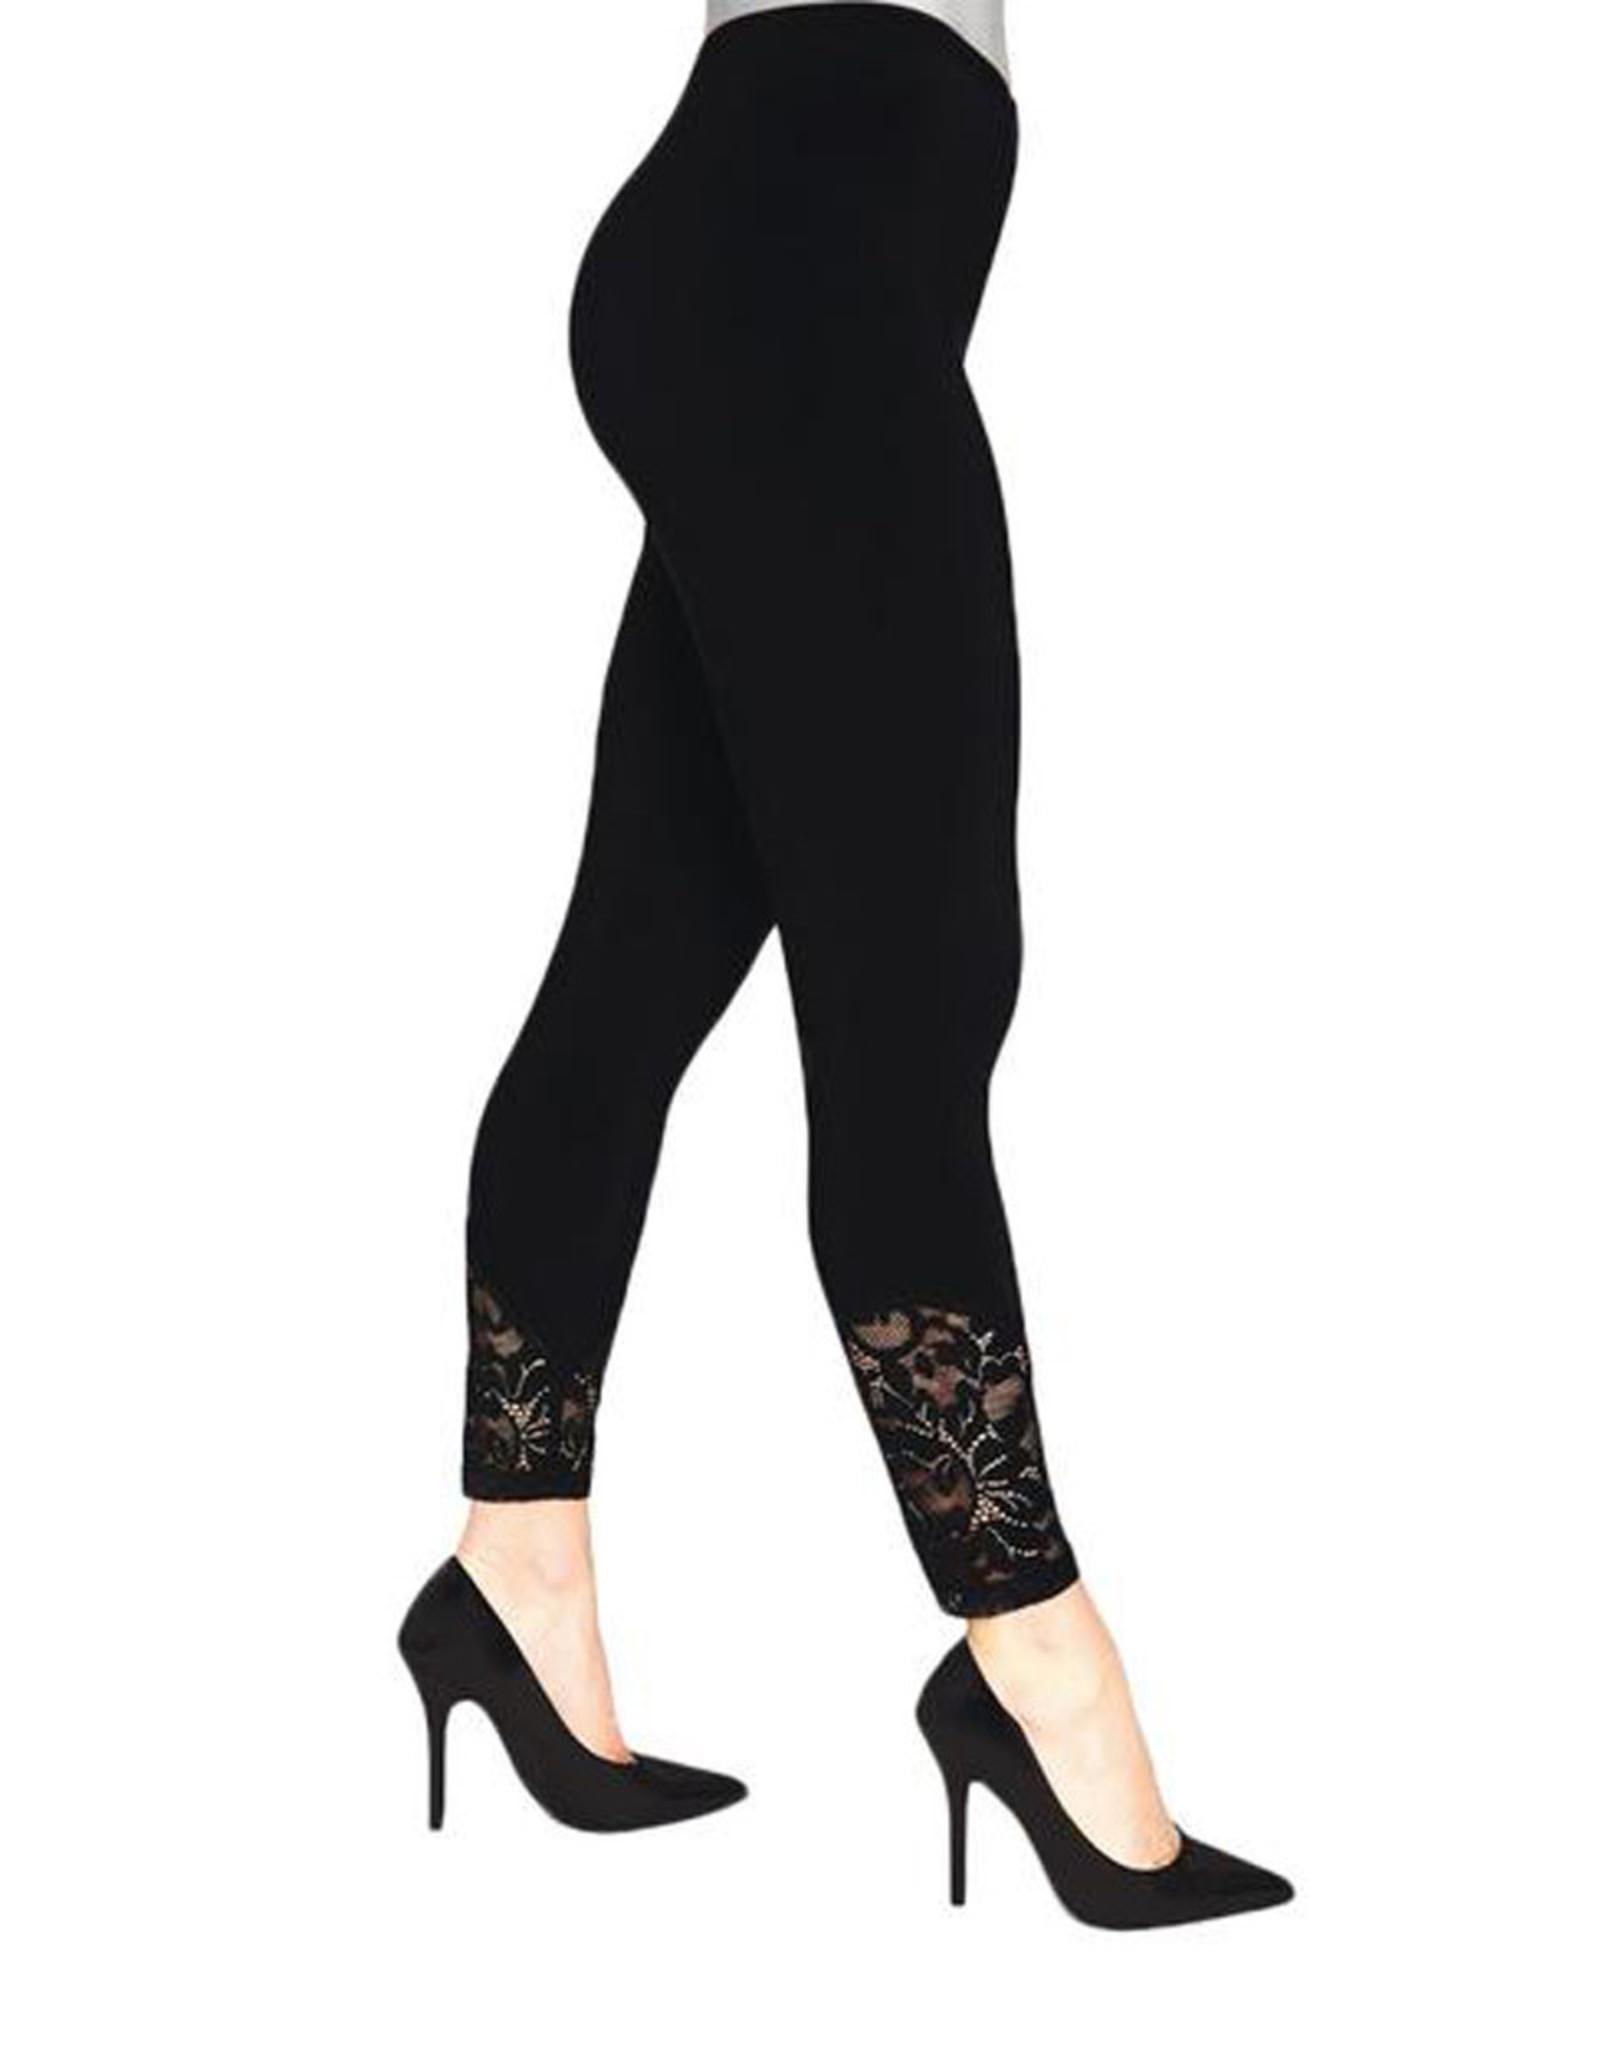 Sympli Lace Leggings - Black